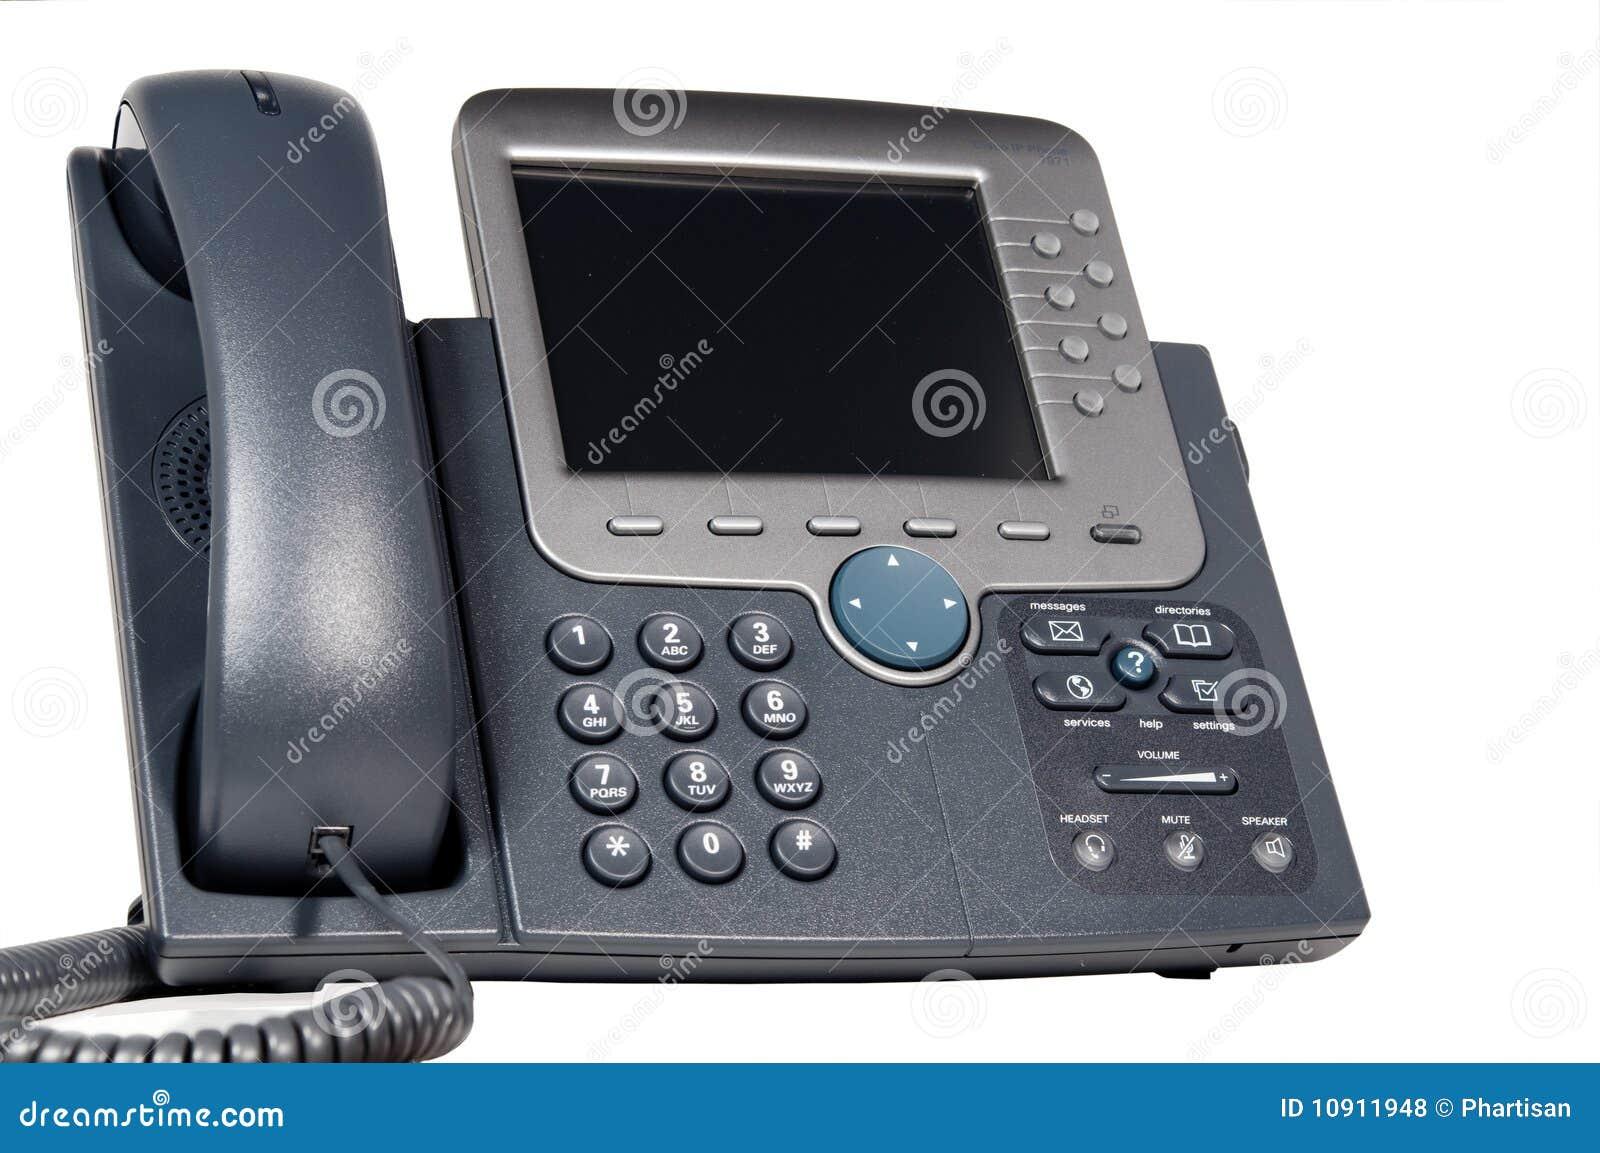 Modern Hi Tech Business Phone Royalty Free Stock Photos ... | 1300 x 953 jpeg 118kB